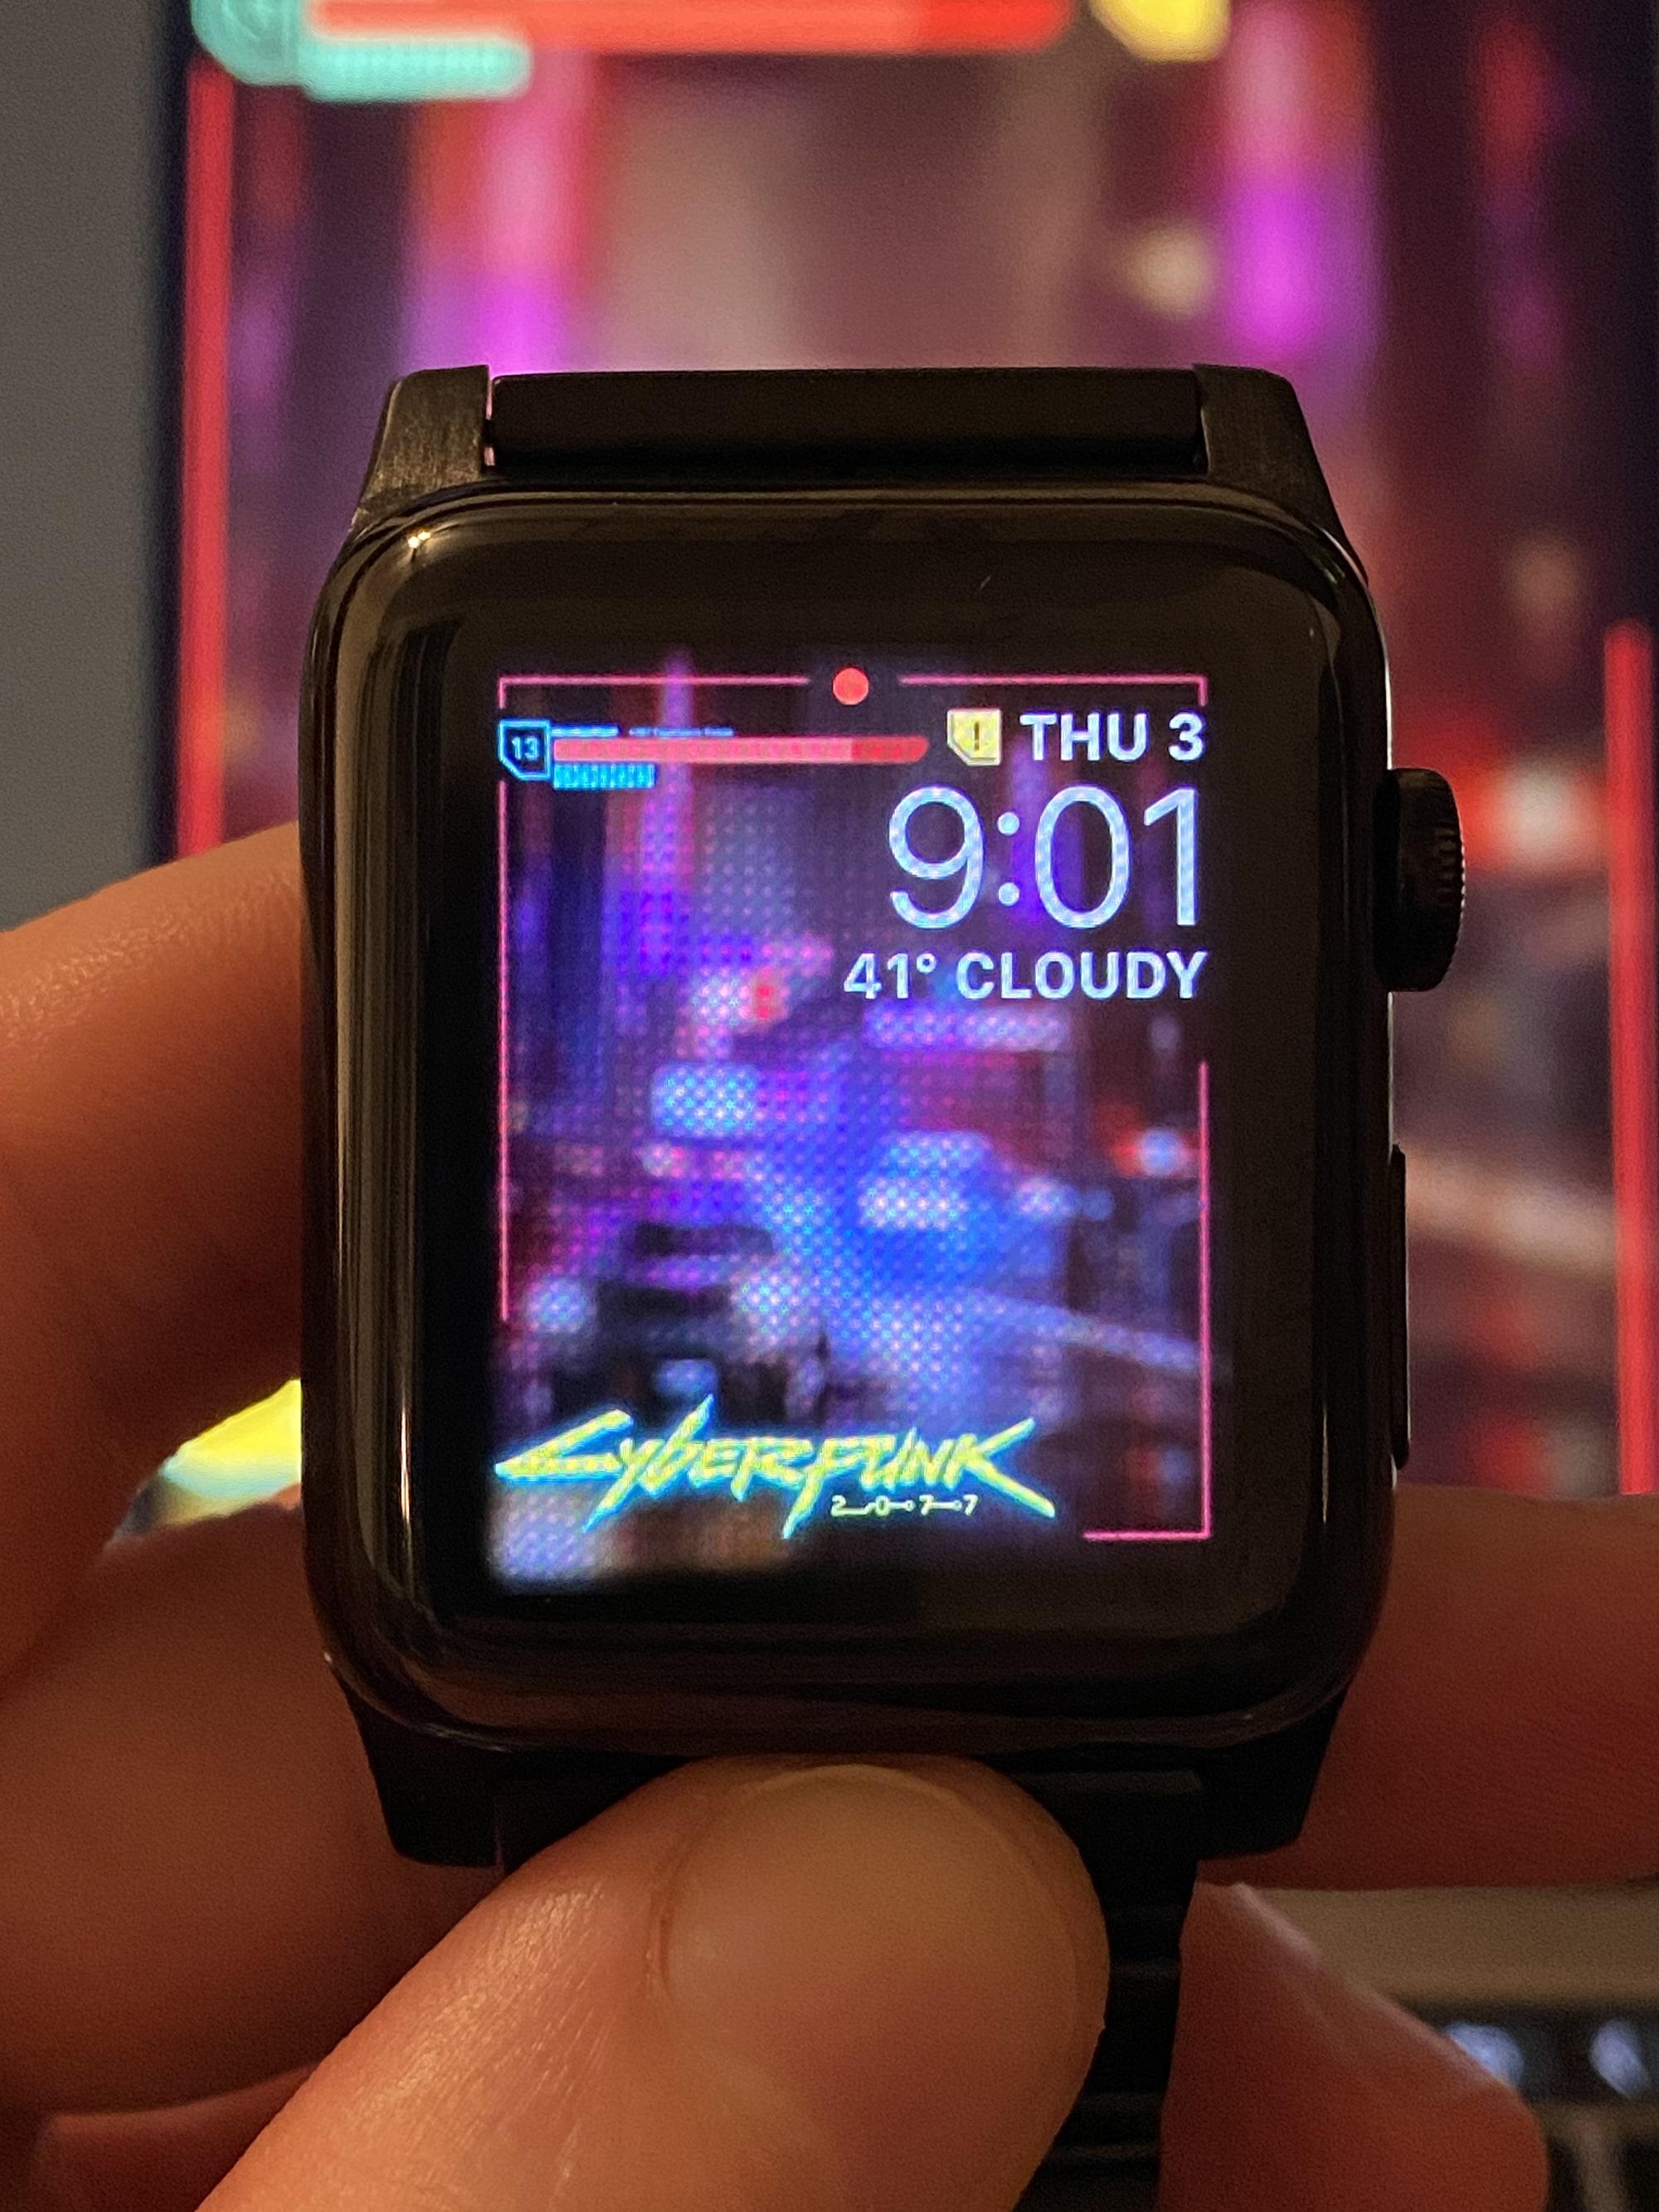 cyberpunk 2077 apple watch face